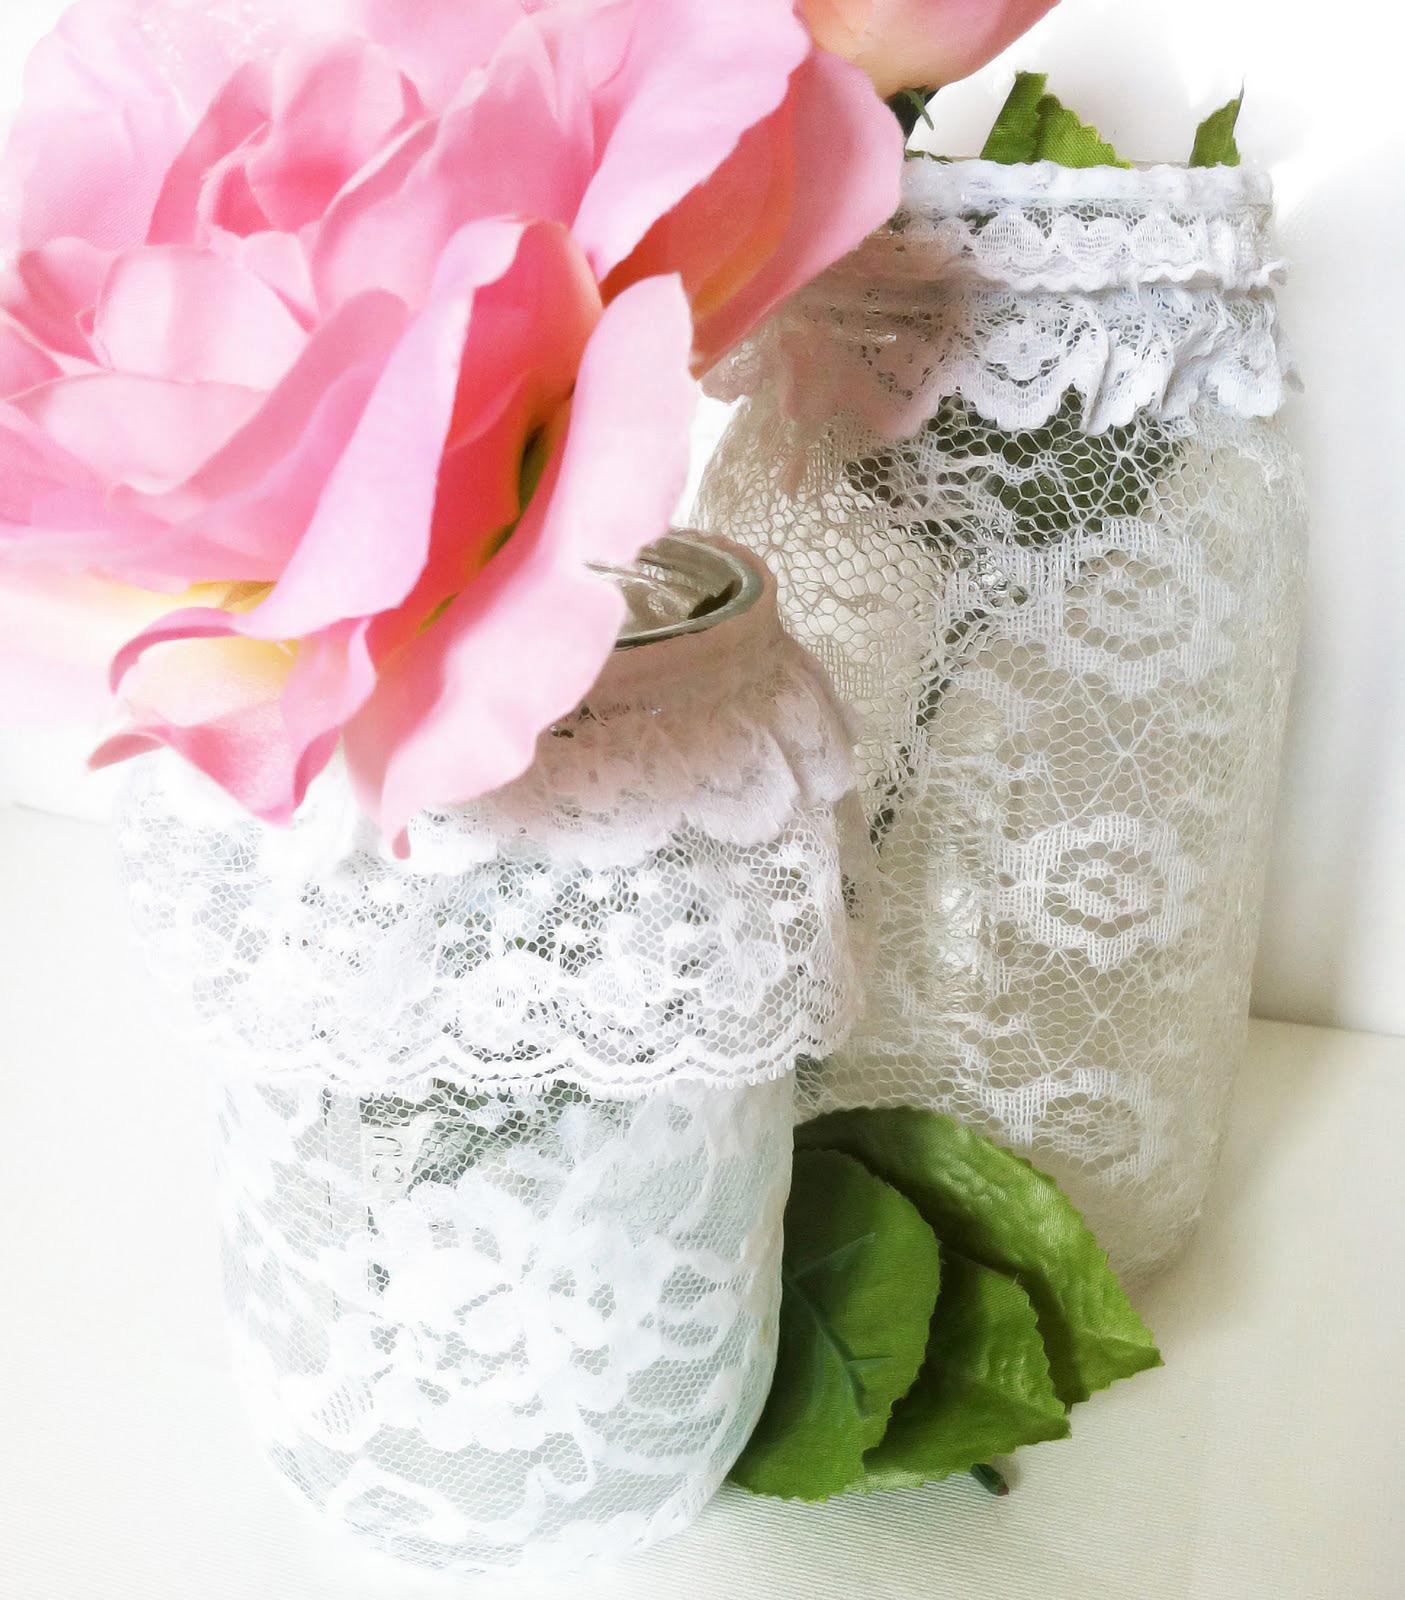 Decorating Mason Jars with Lace